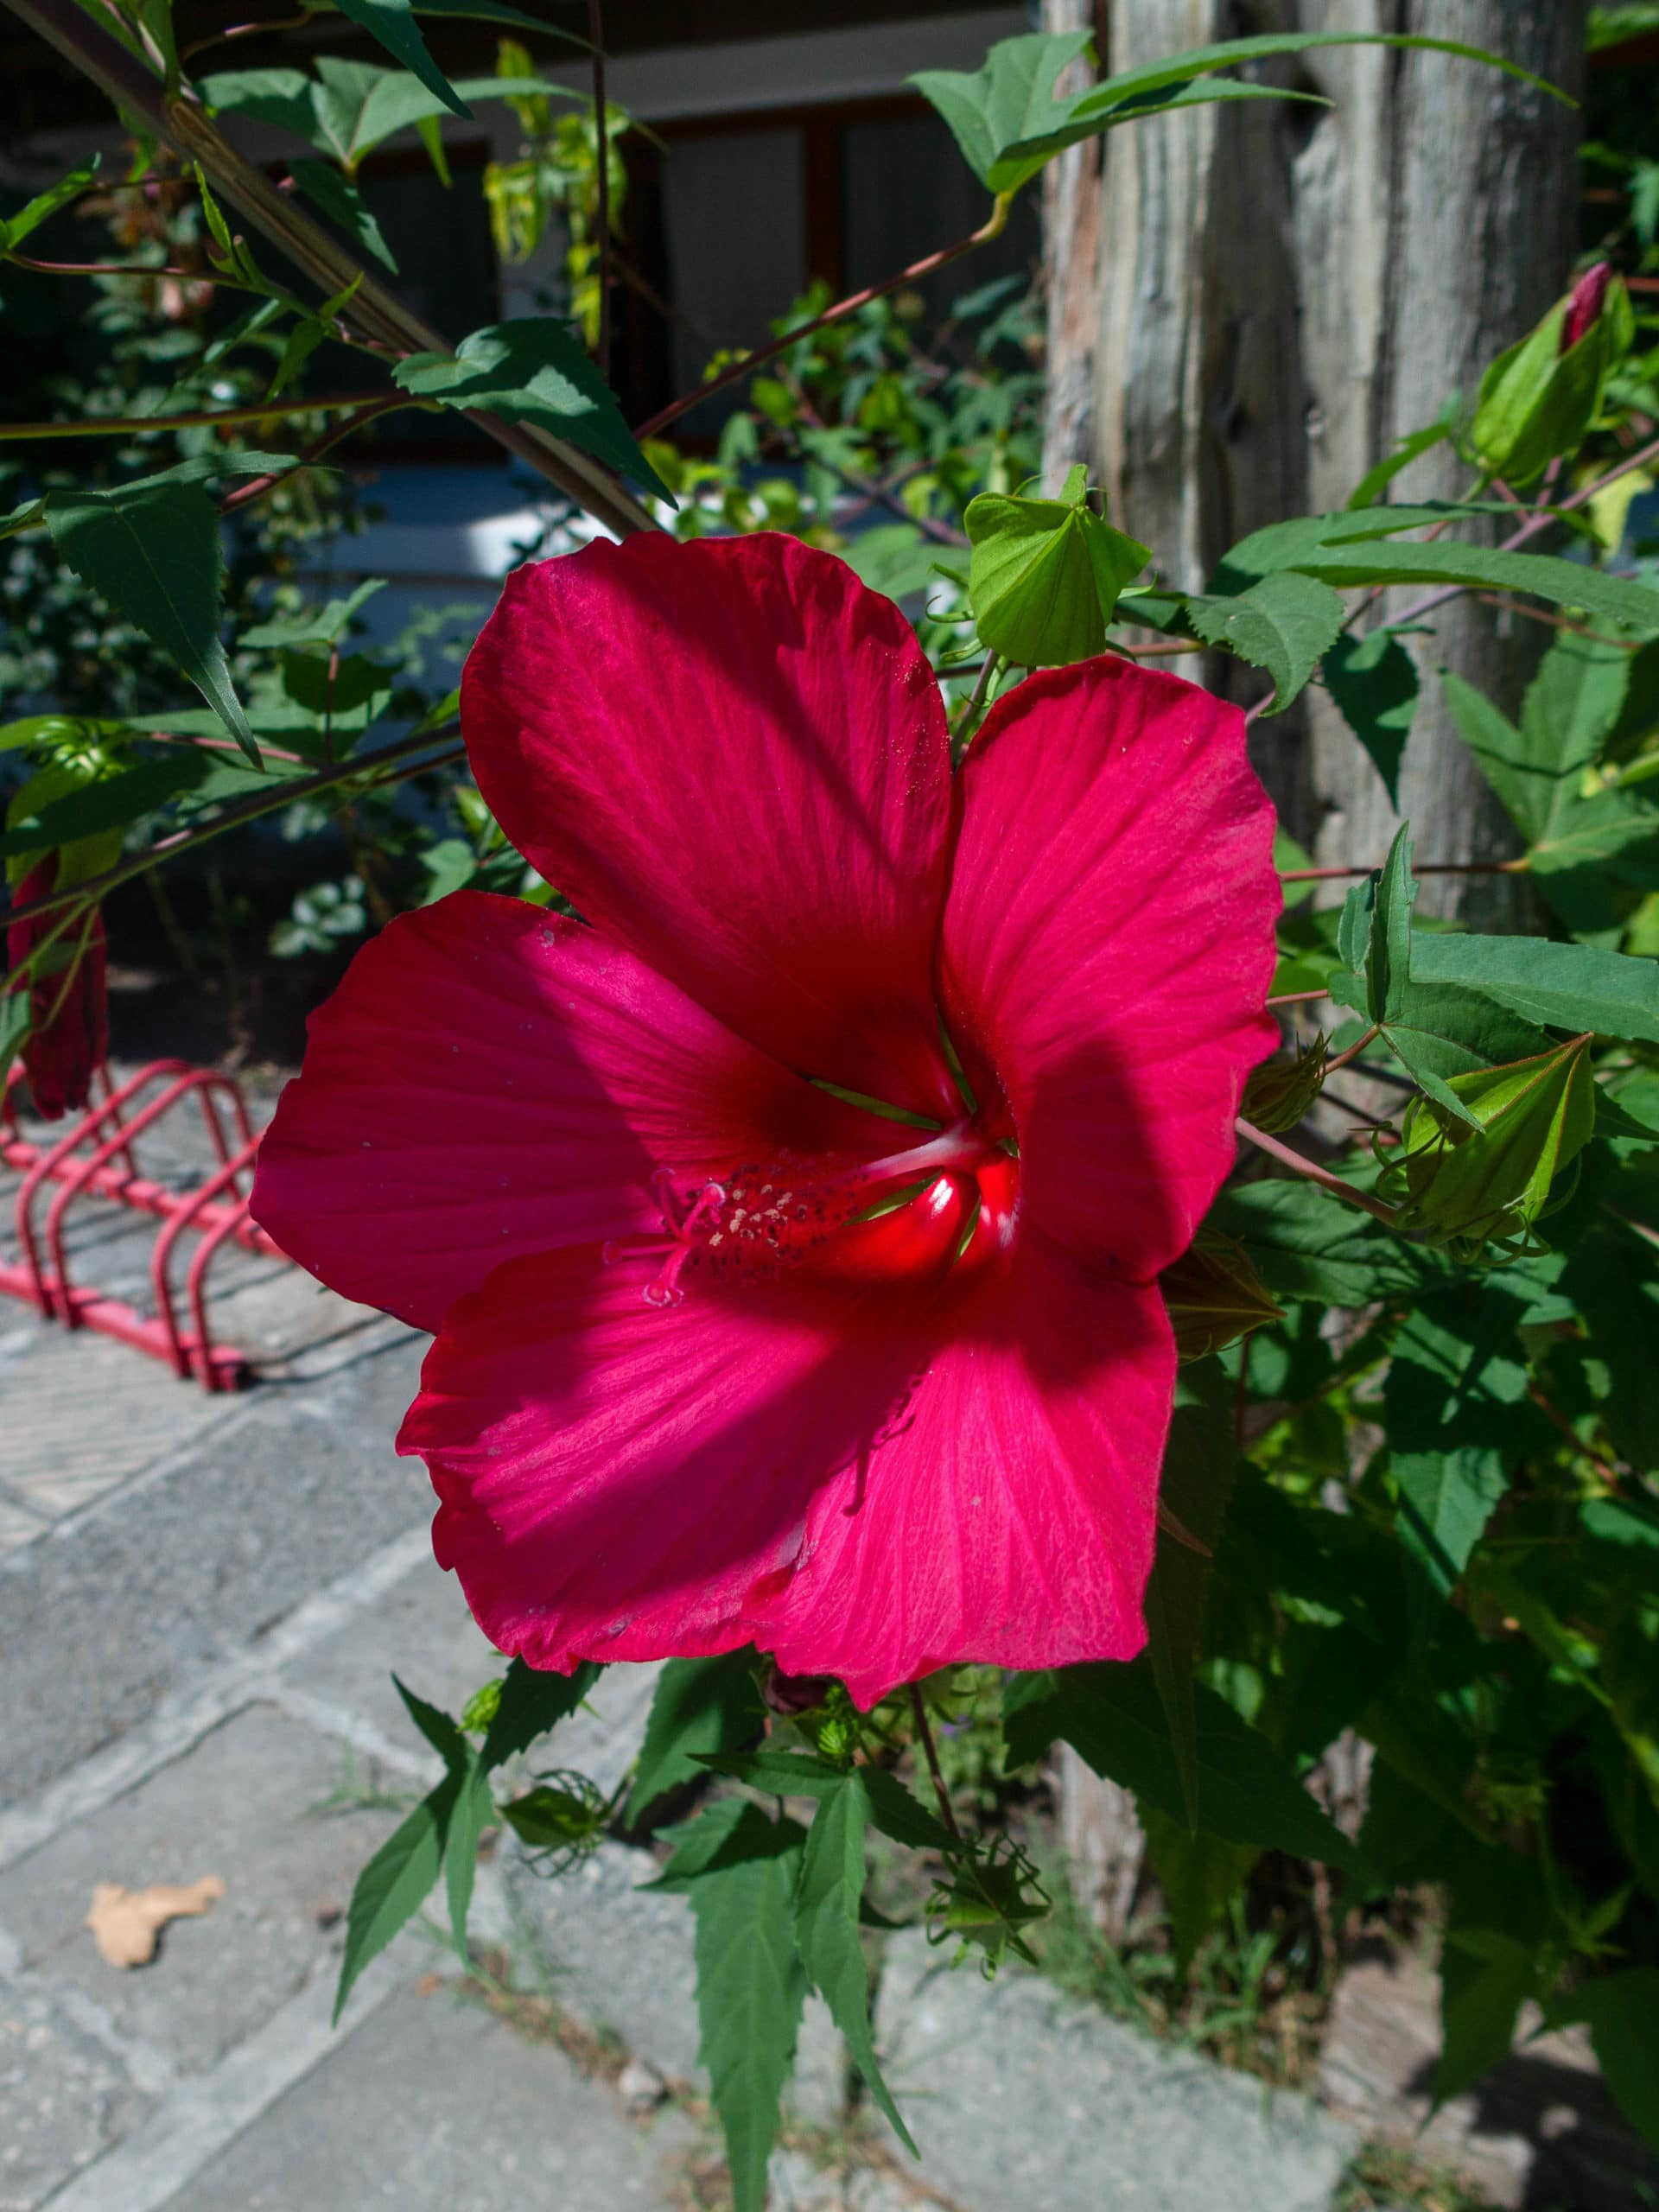 Pinkfarbene Blume nahaufname, im Hintergrund blaetter, Varna